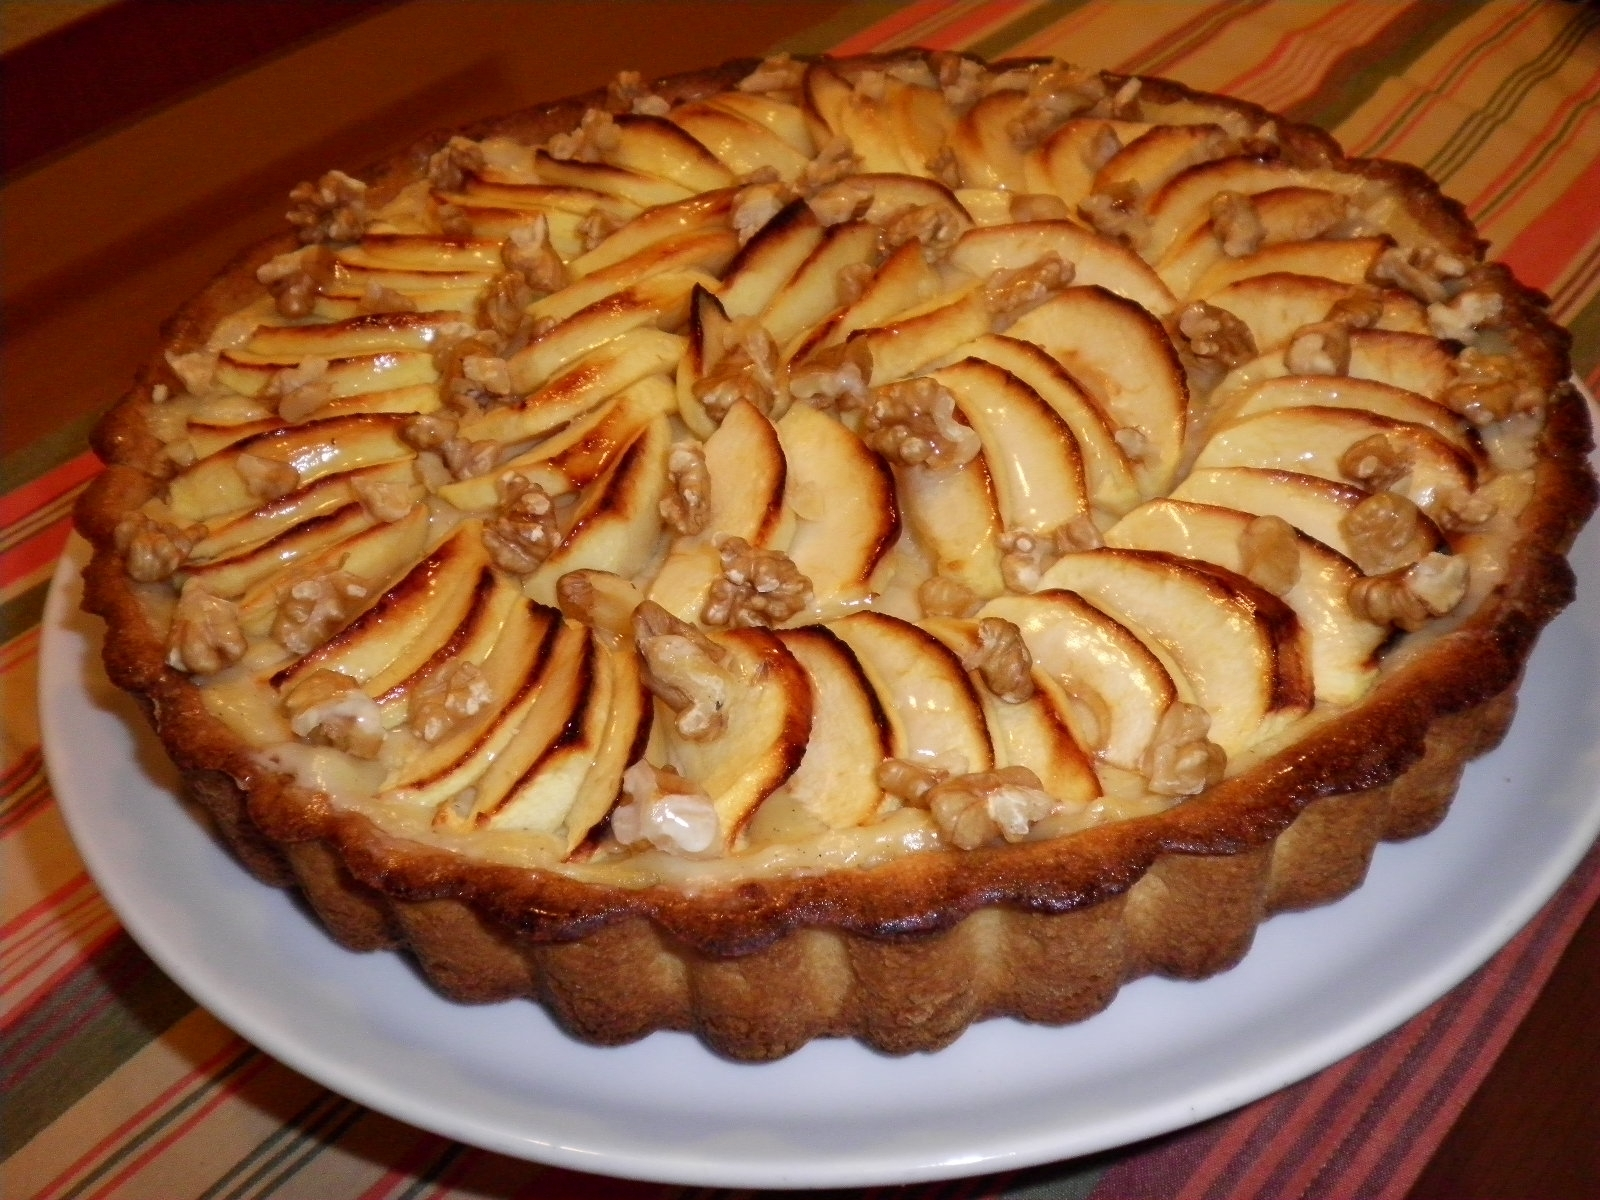 Tarta de manzana con crema pastelera mis dulces joyas for Brisa cuchillos